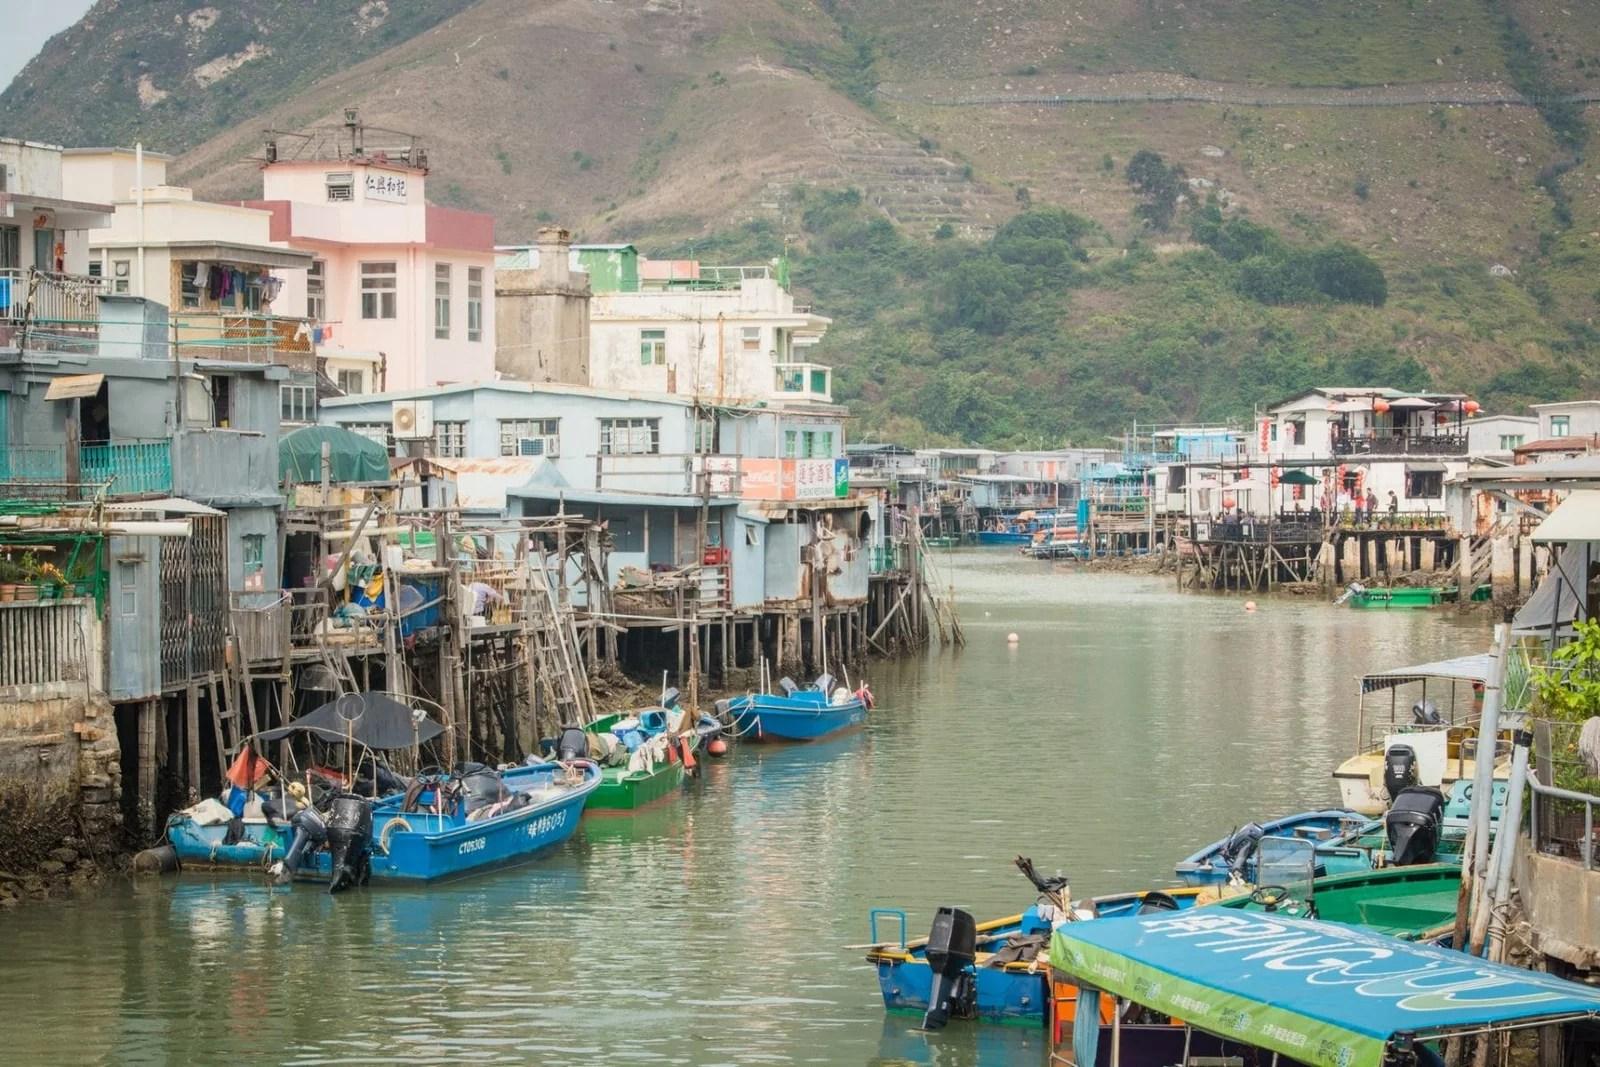 port village tai o - lantau island hong kong